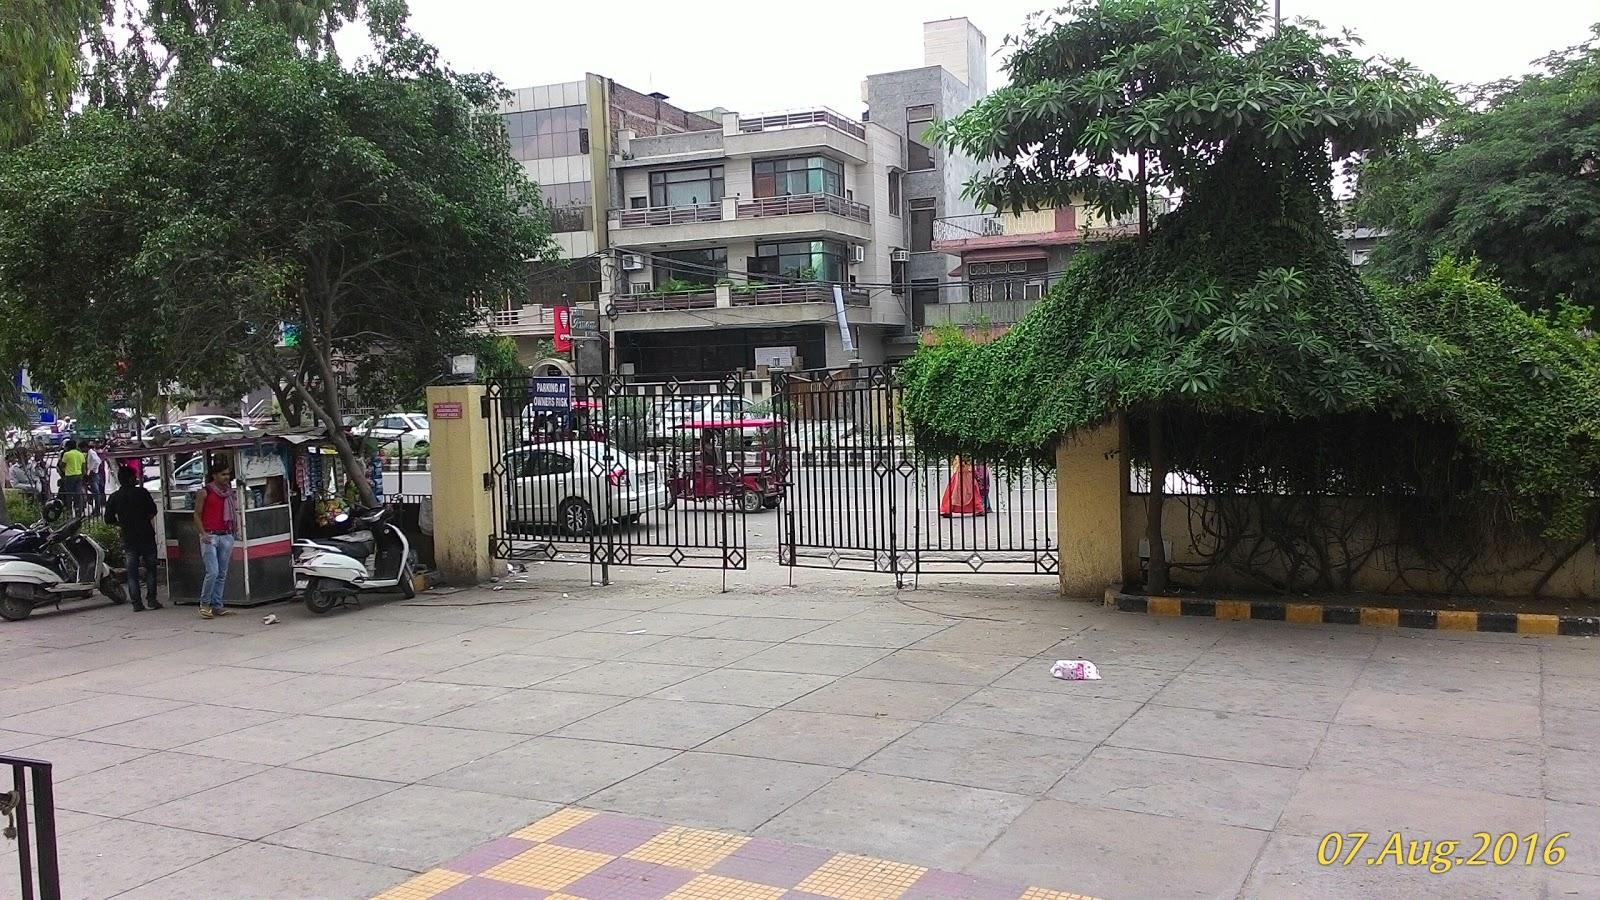 Pvr (Vikaspuri)